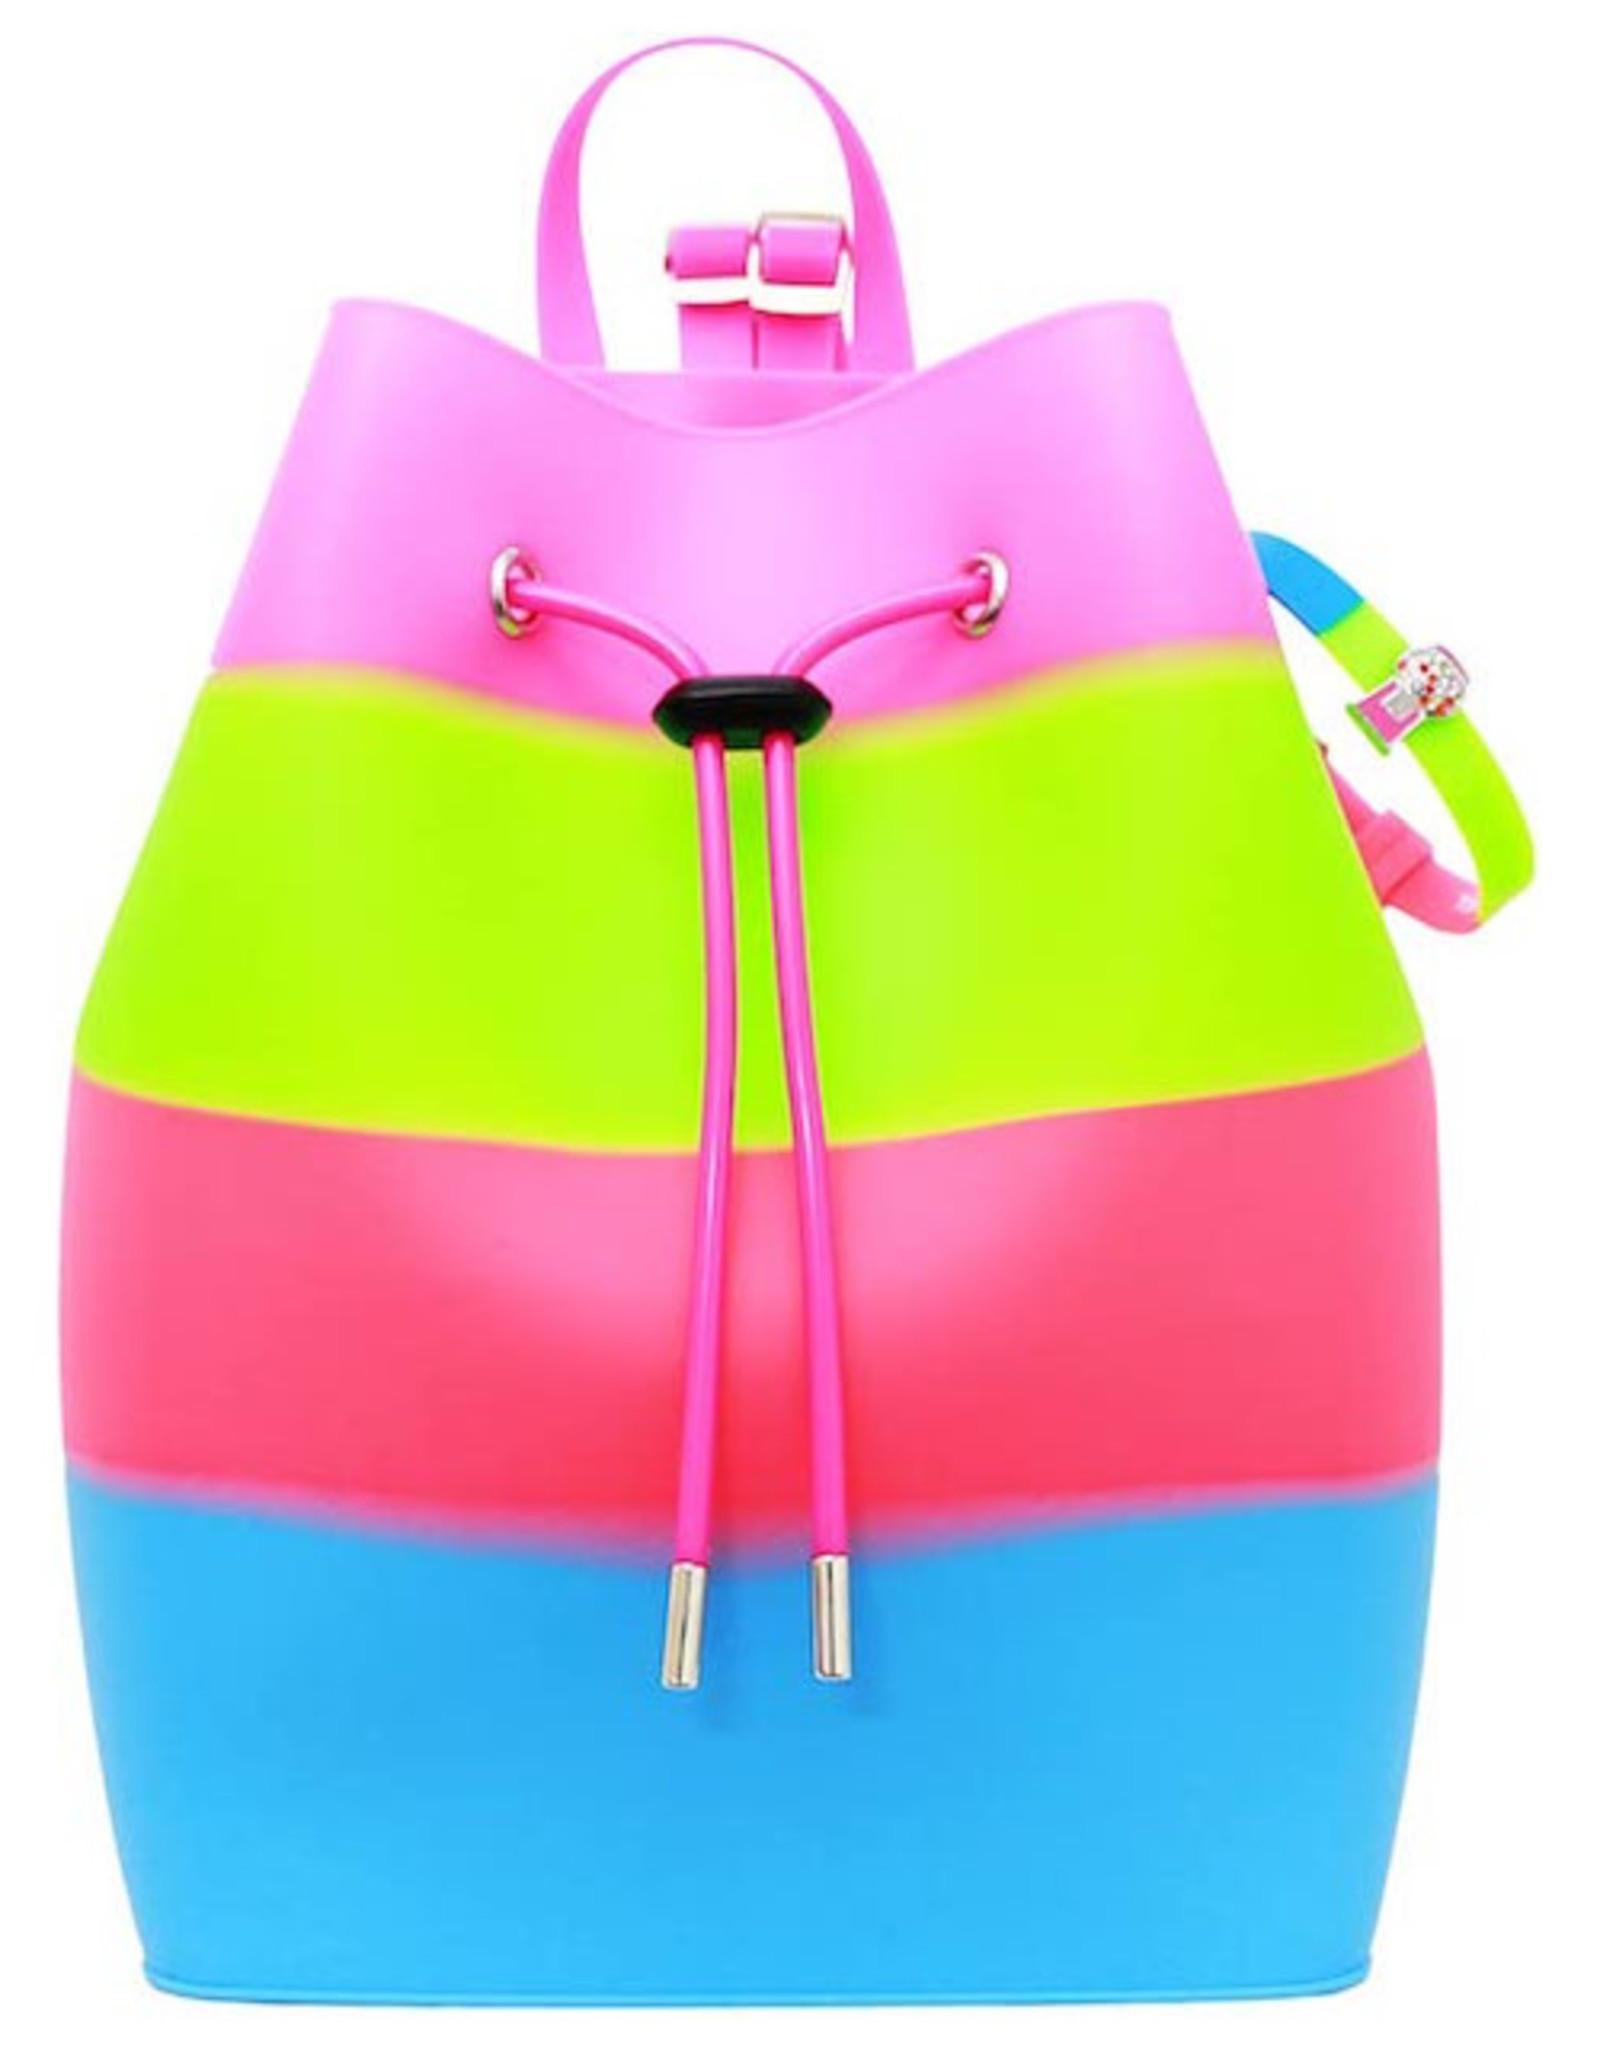 American Jewel Ice Cream Rope Collection Bucket Bag